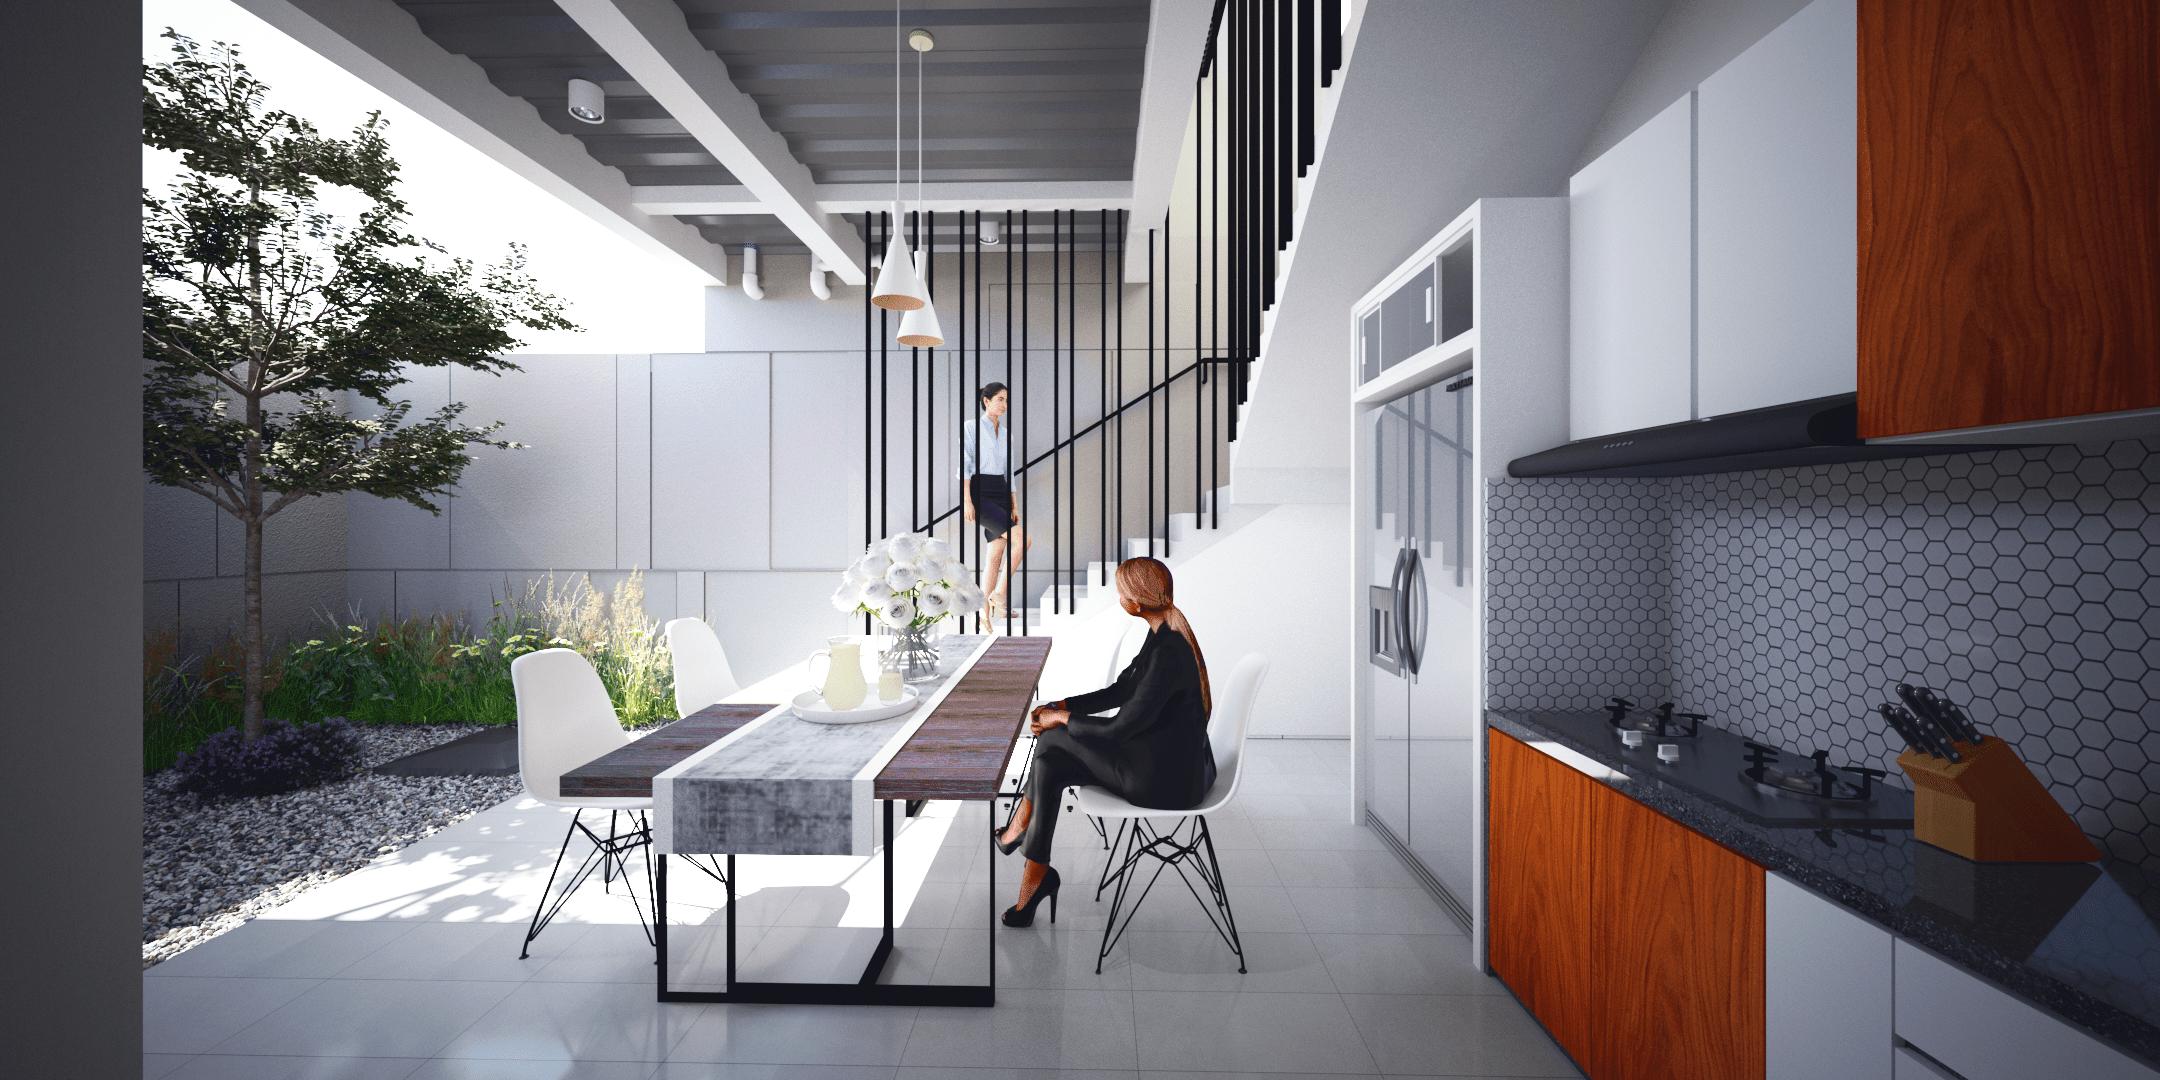 desain arsitektur renovasi interior ruang service area di malang jawa timur